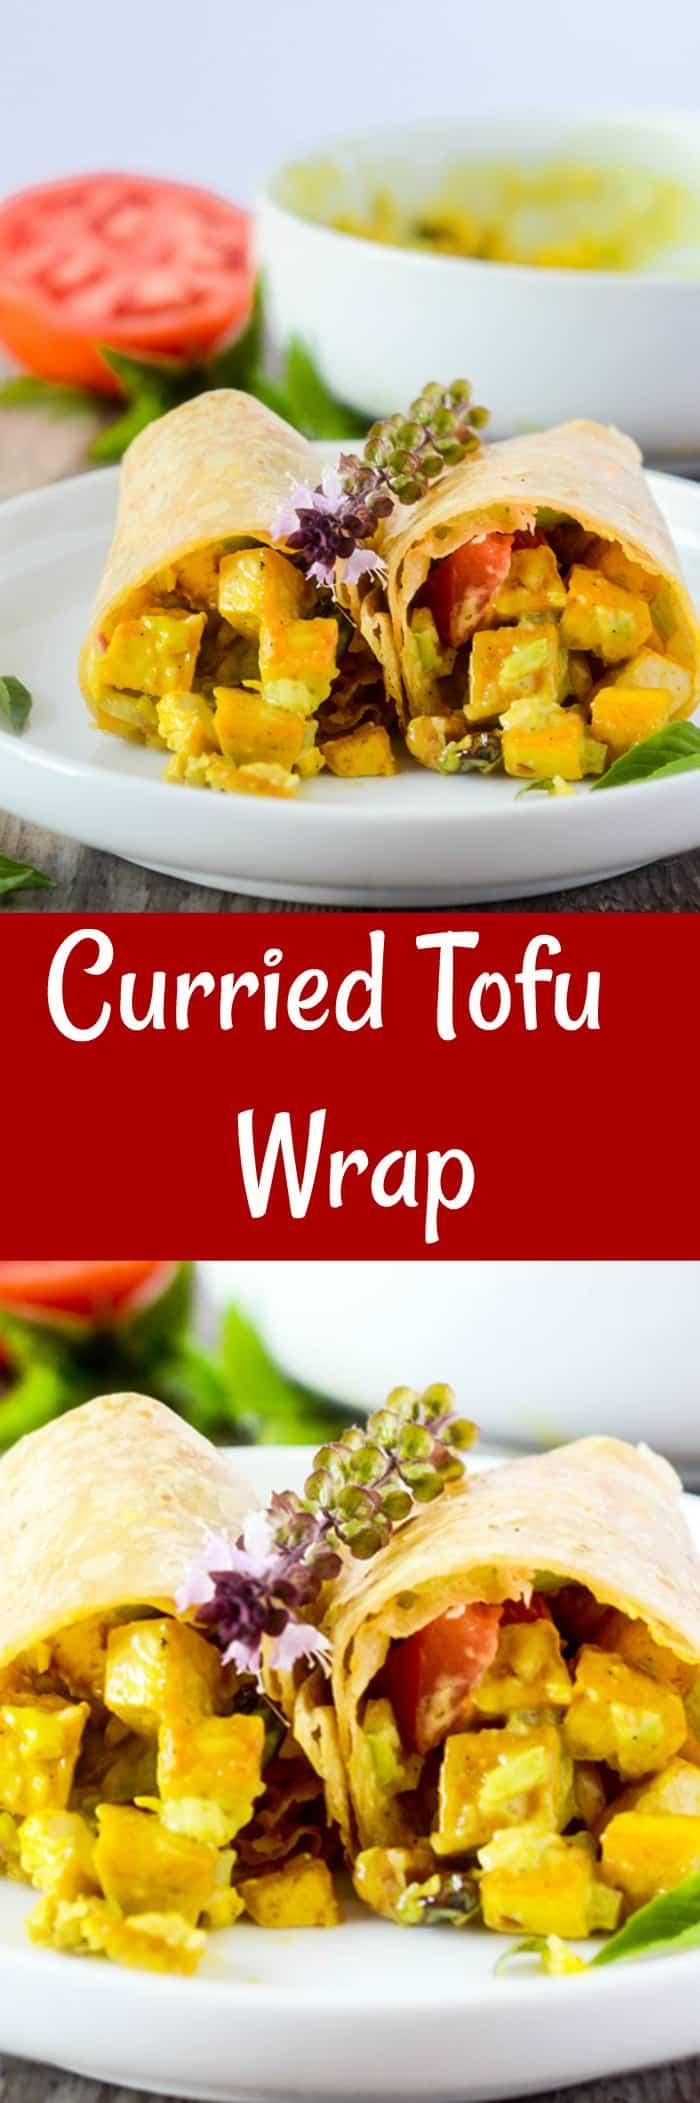 Curried Tofu Wrap